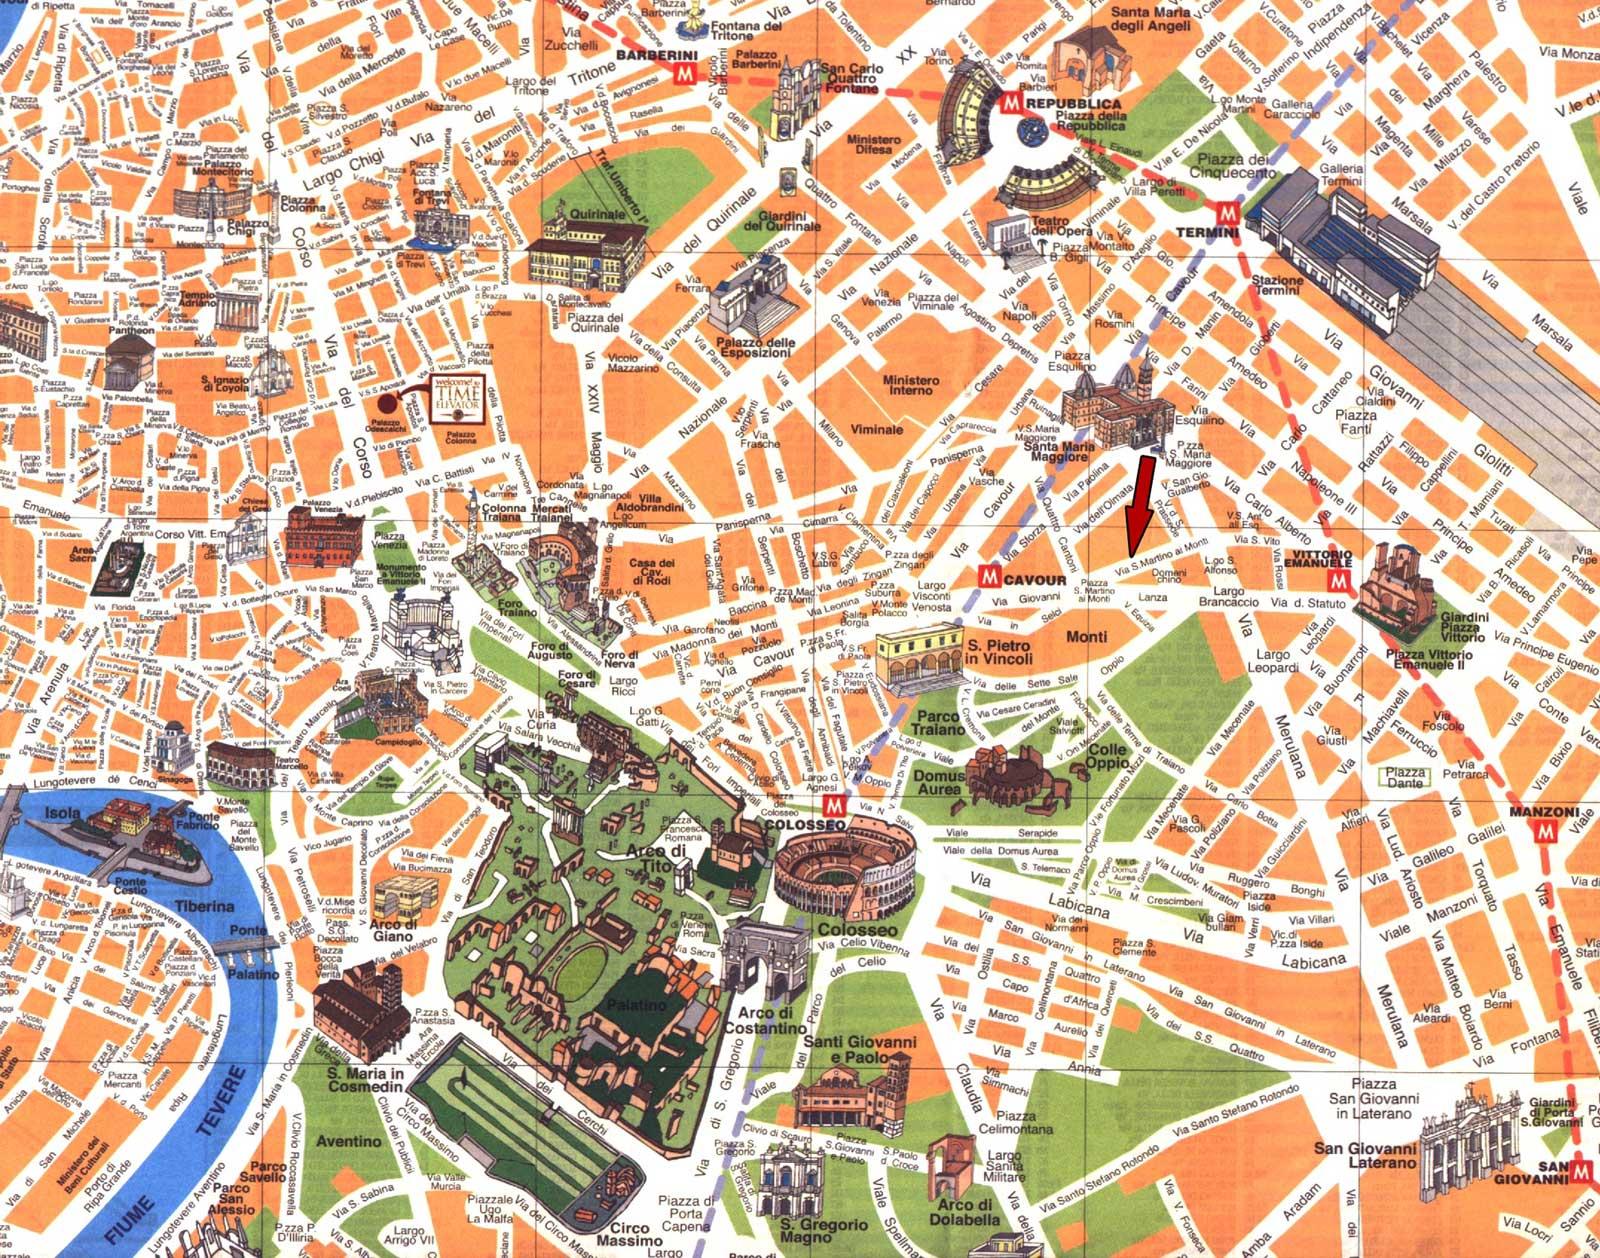 Atlas mapas turisticos de roma for Oficina turismo roma